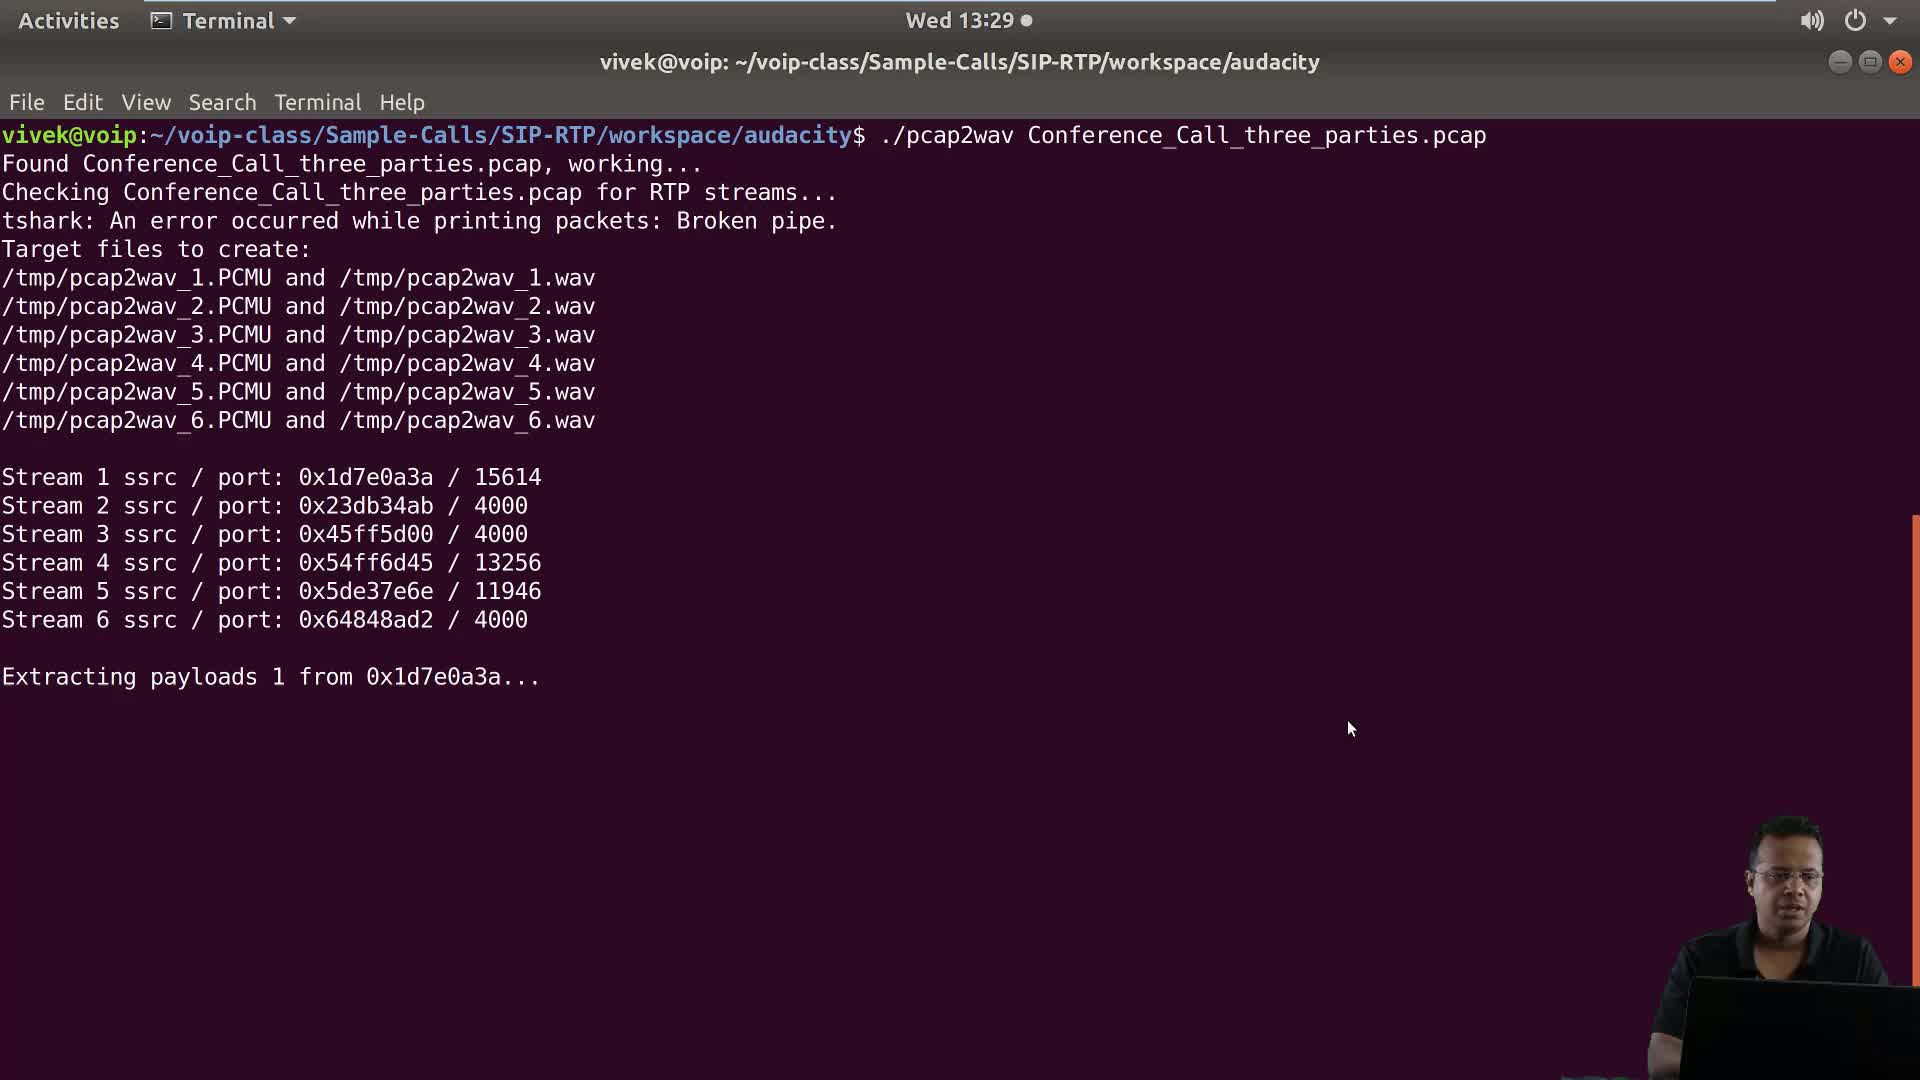 Using Audacity to Analyze VoIP Voice Data